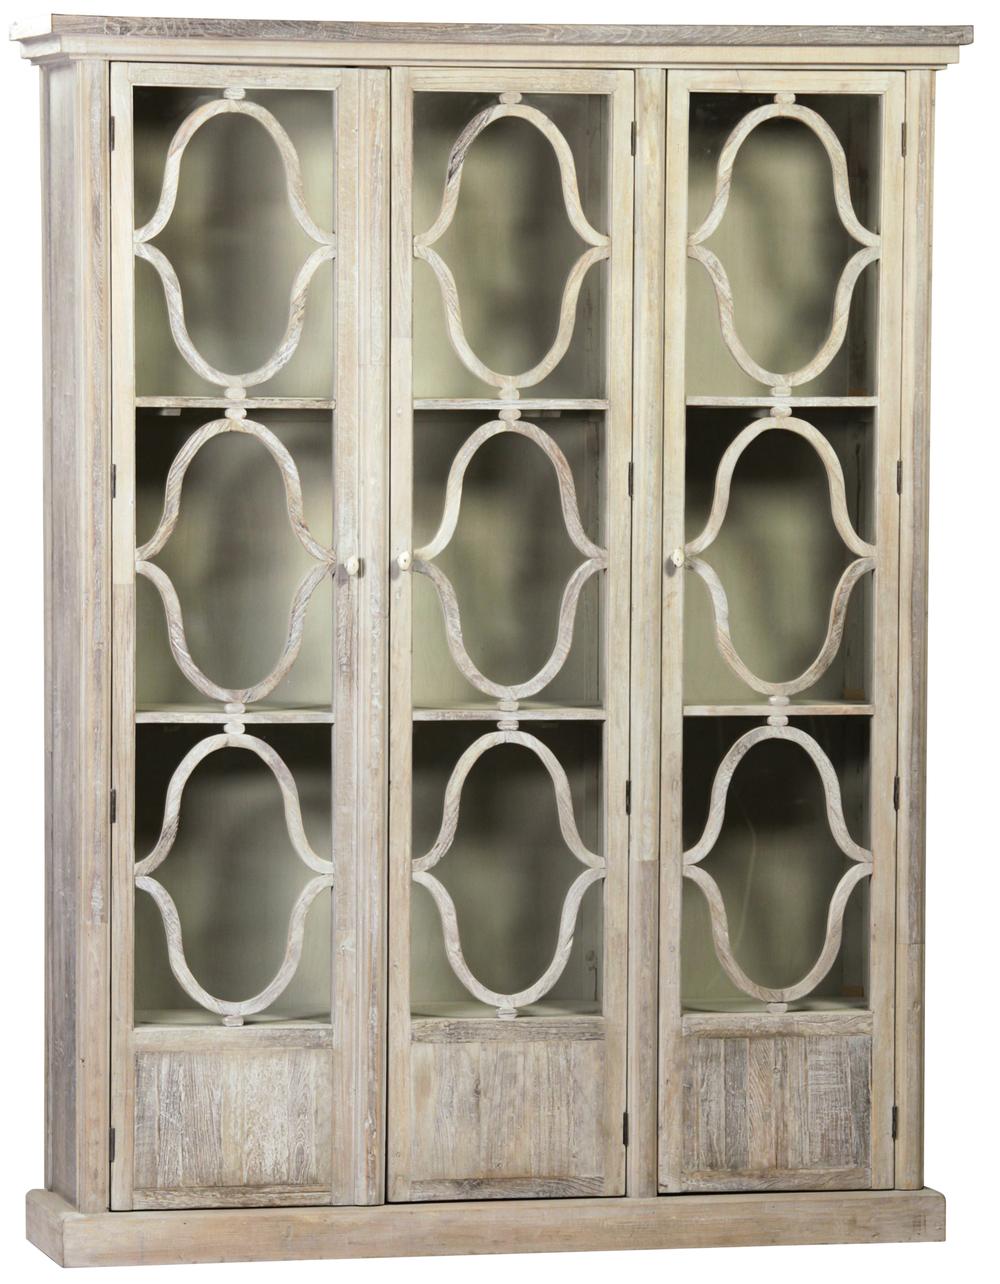 Dovetail Furniture - Oldhan Cabinet